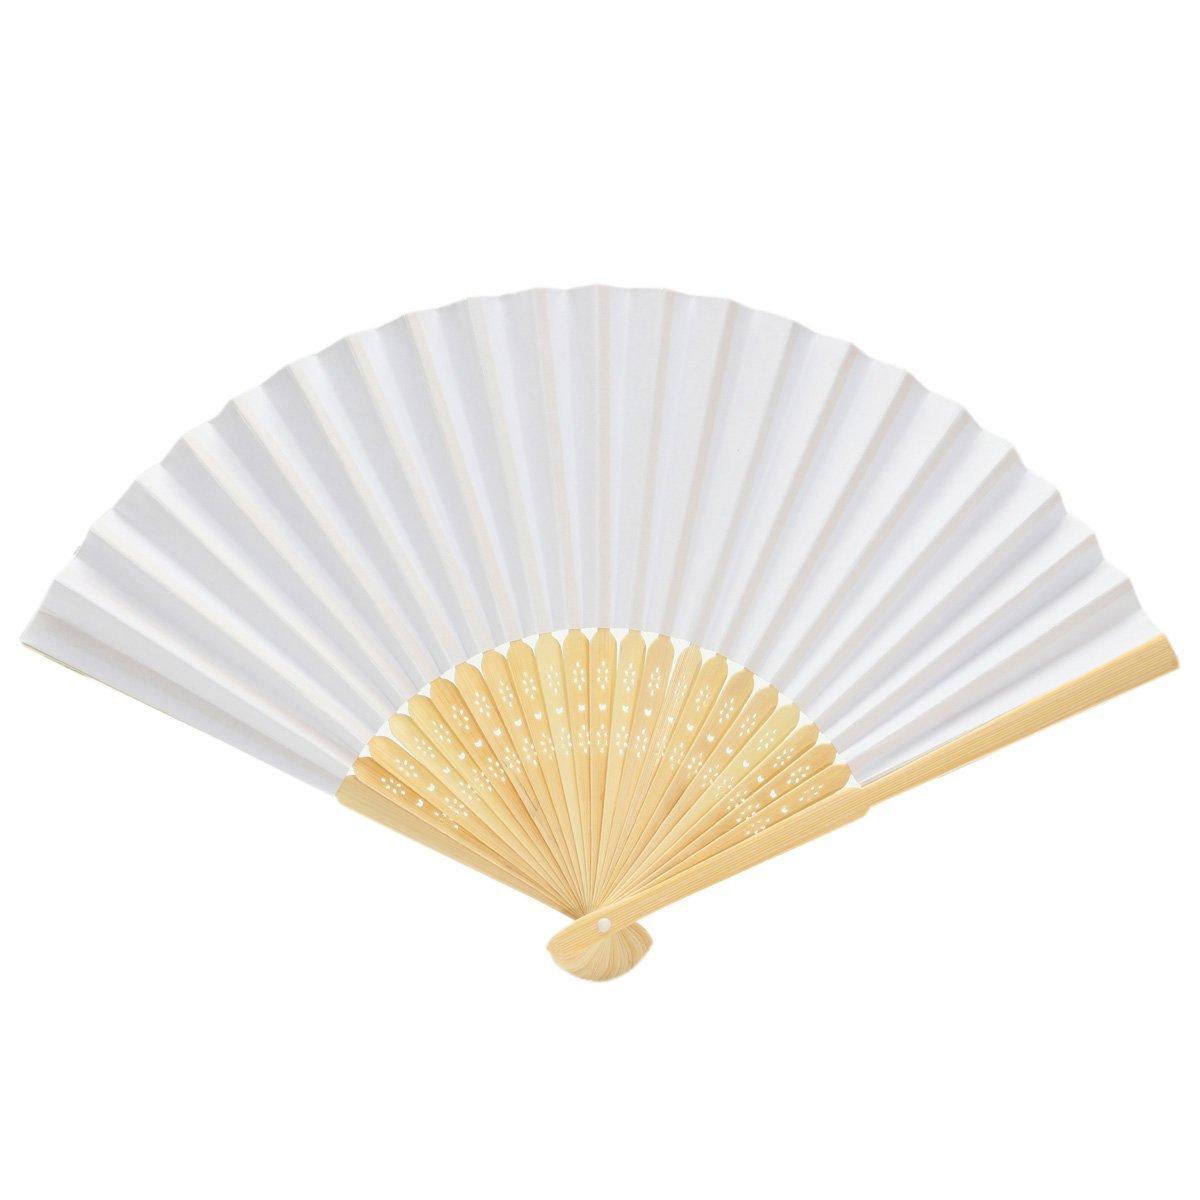 Amazon.com: KINGSO 10PCS White Blank Paper Handheld Folding Fan with ...